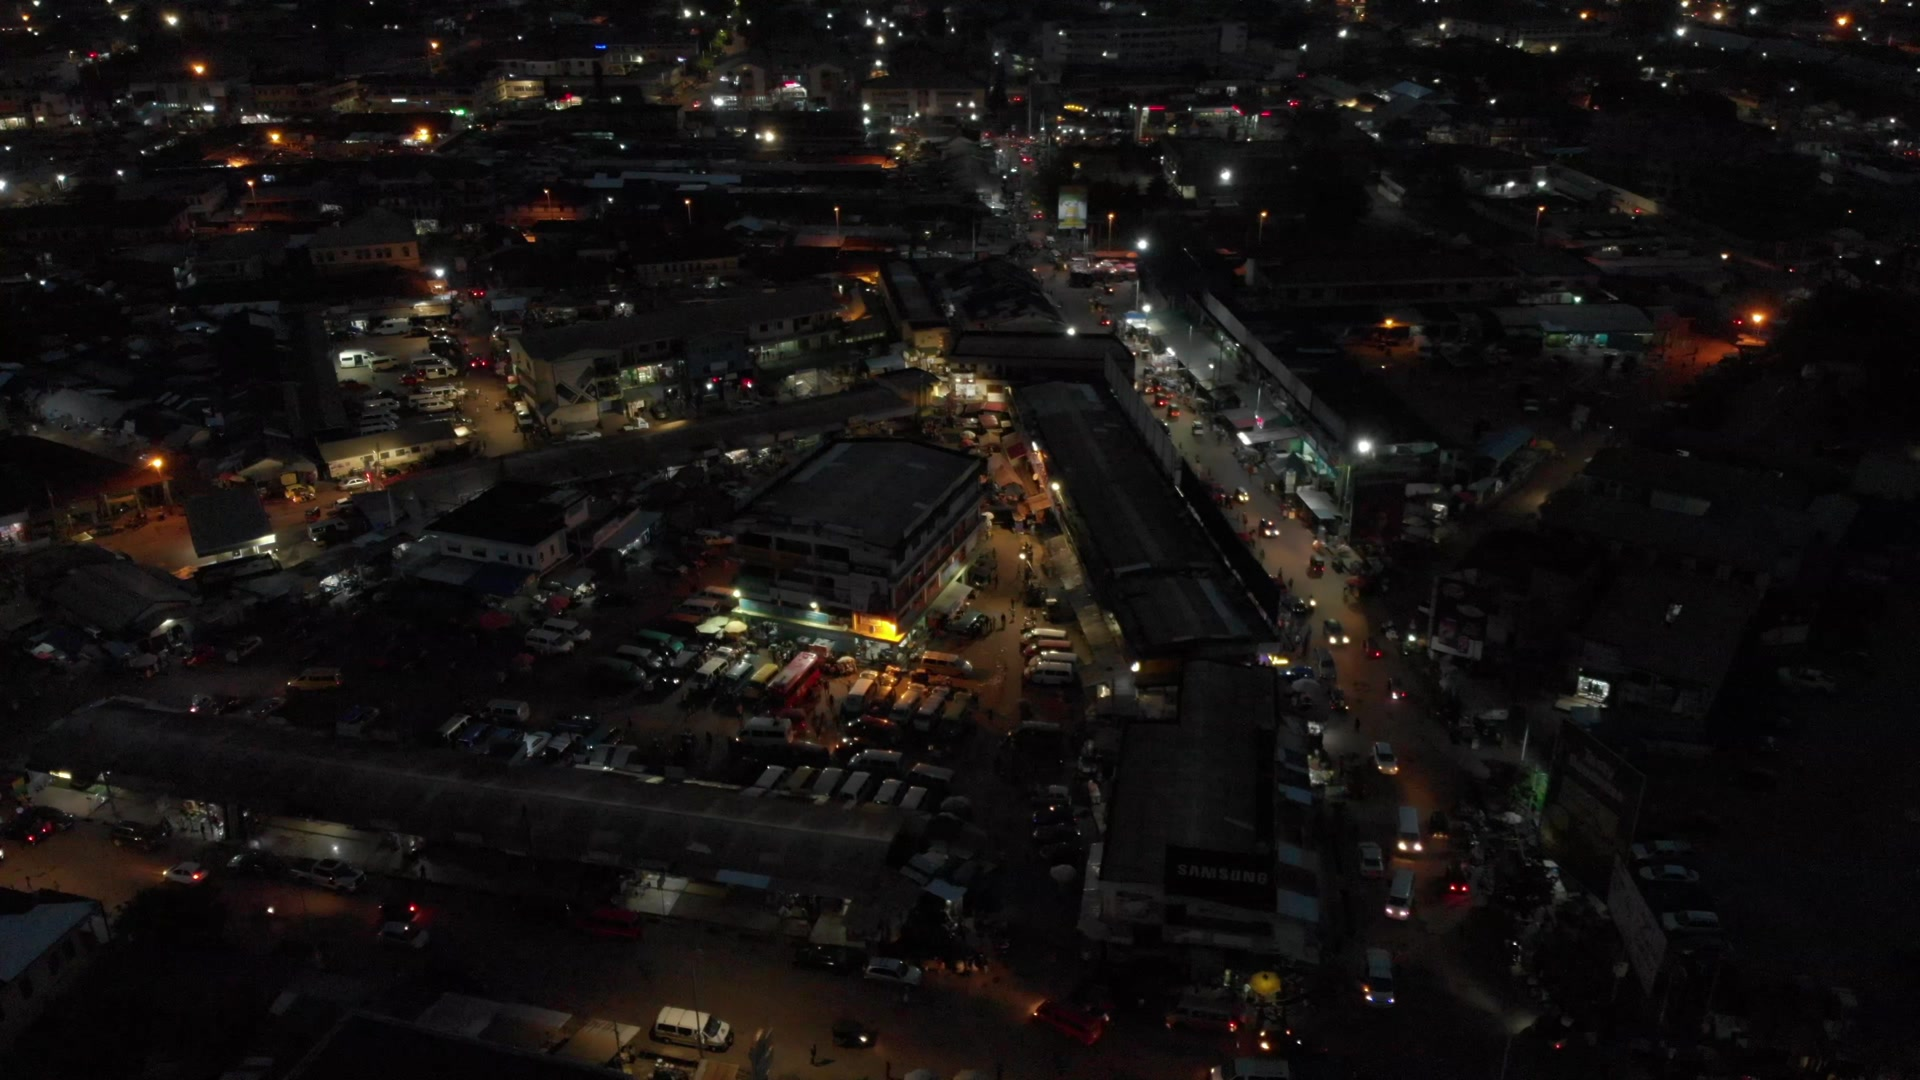 Koforidua Township Night Flyover Full Video